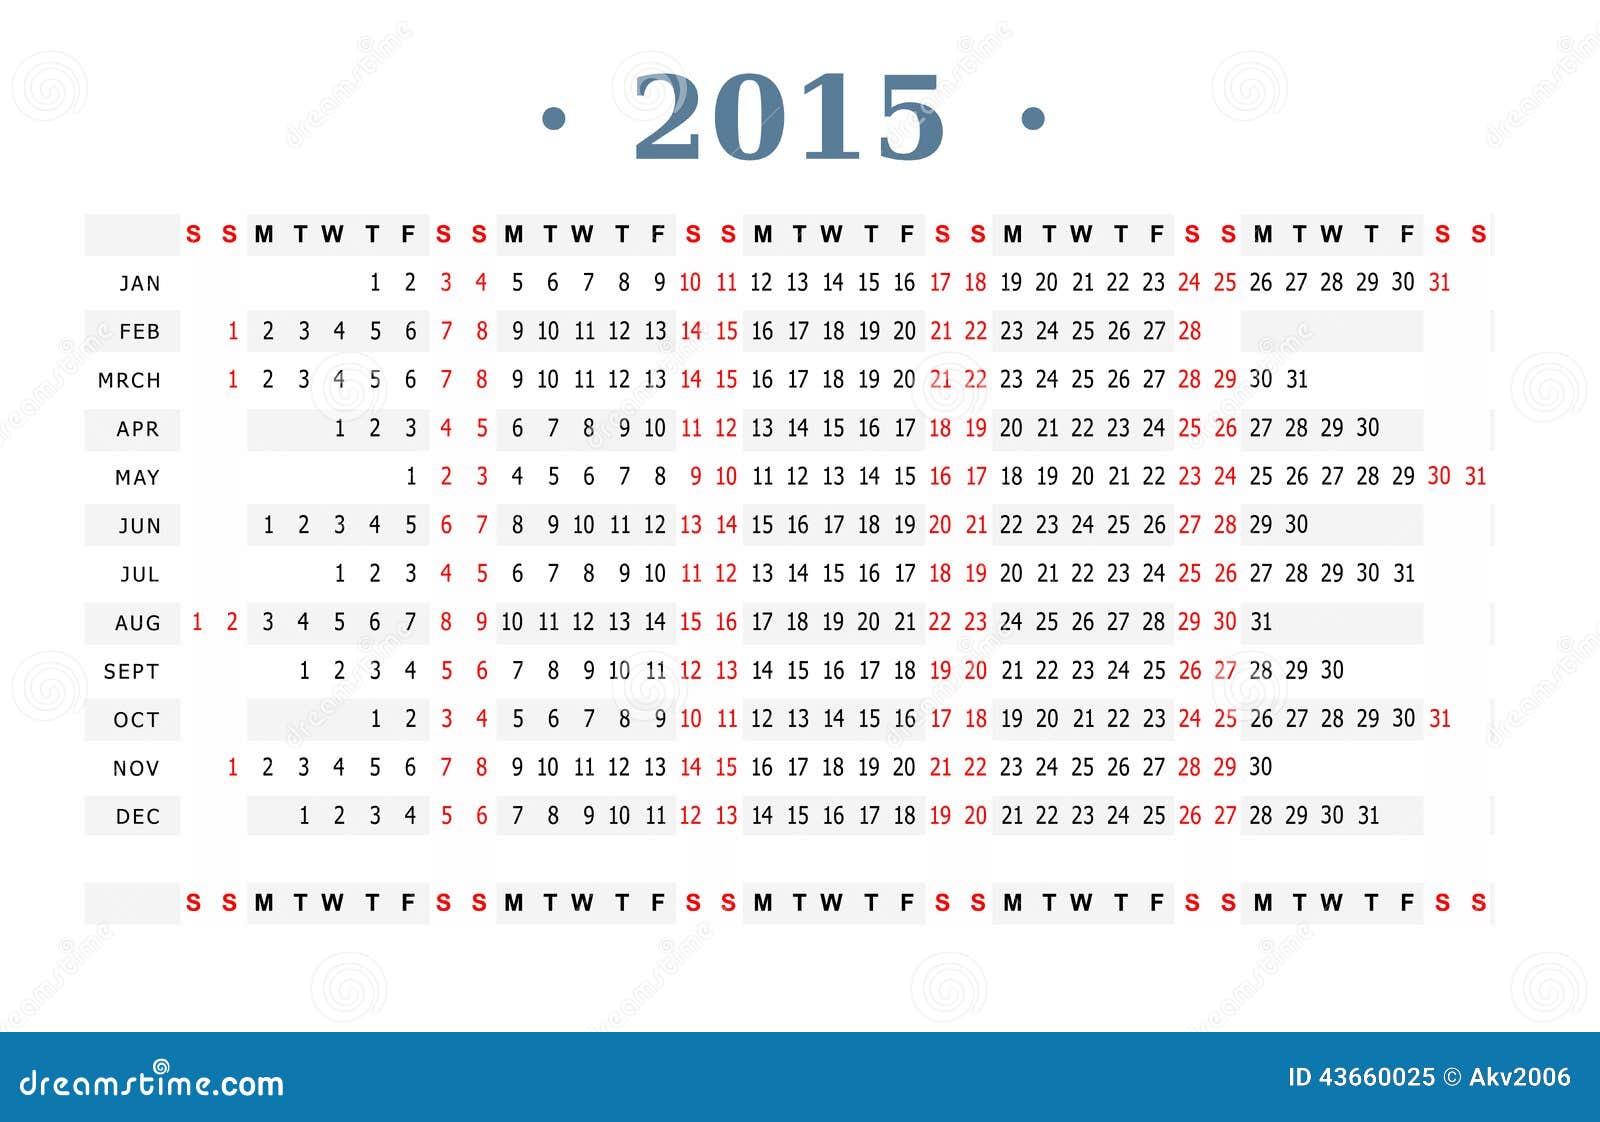 Calendar 2015 Print Stock Vector - Image: 43660025